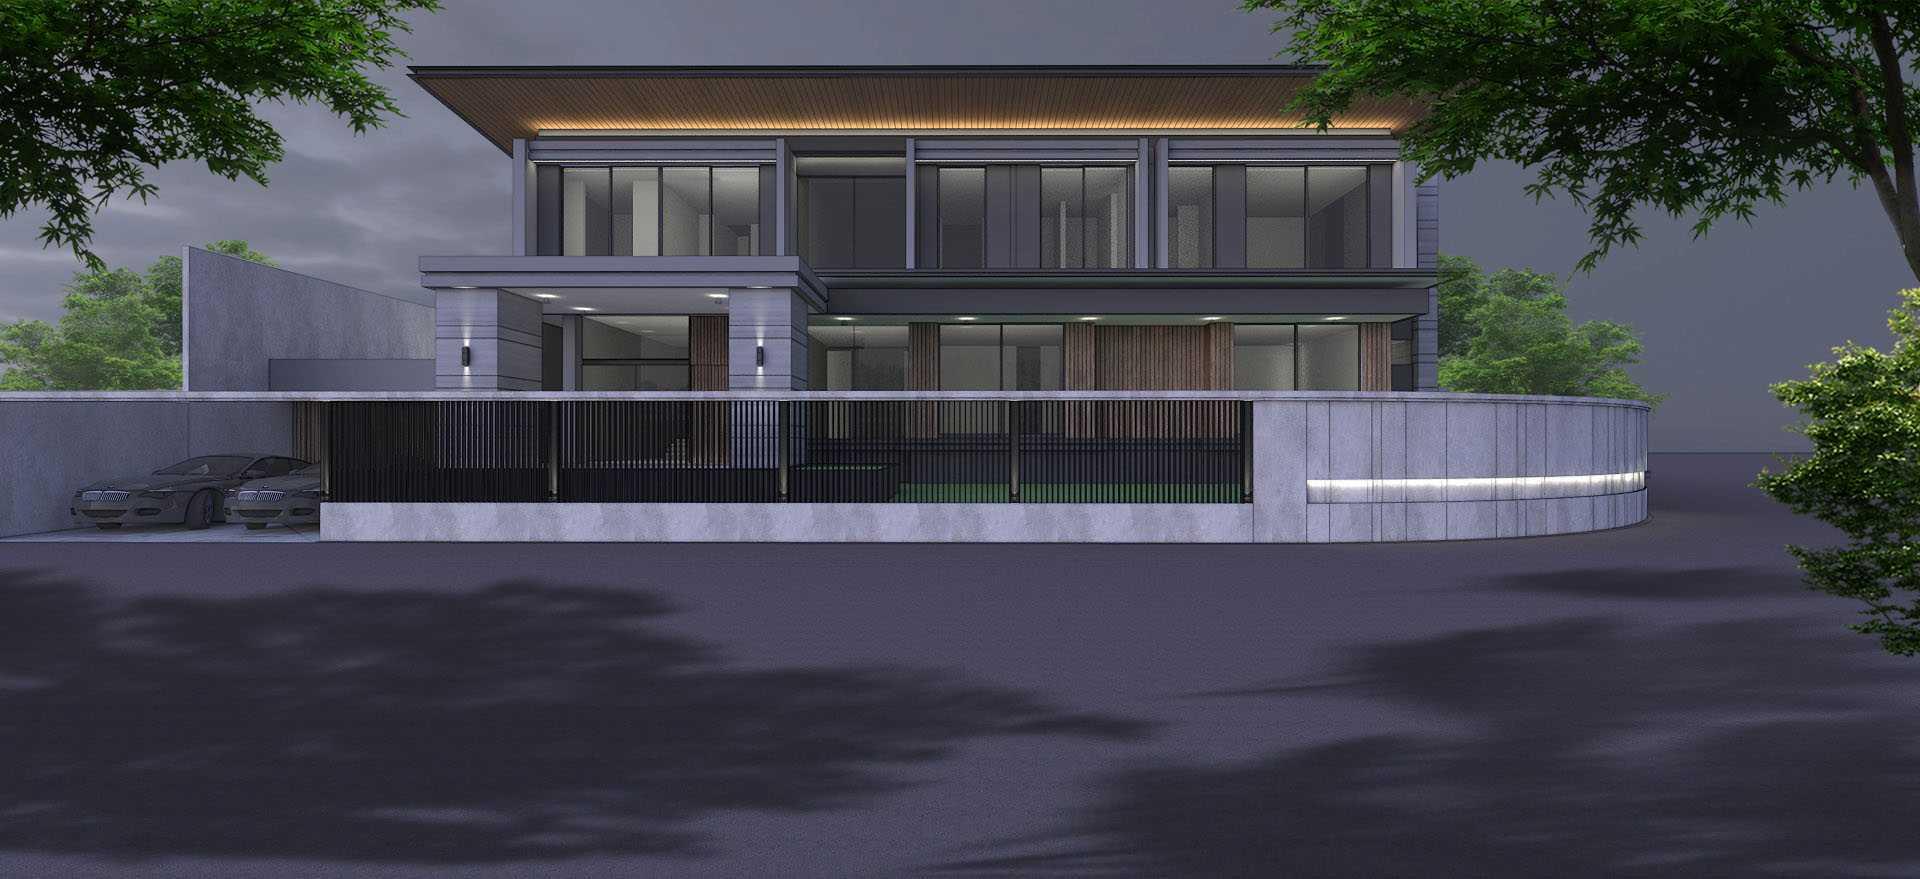 Q Studio R House Tangerang, Kota Tangerang, Banten, Indonesia Tangerang, Kota Tangerang, Banten, Indonesia Q-Studio-R-House  120353